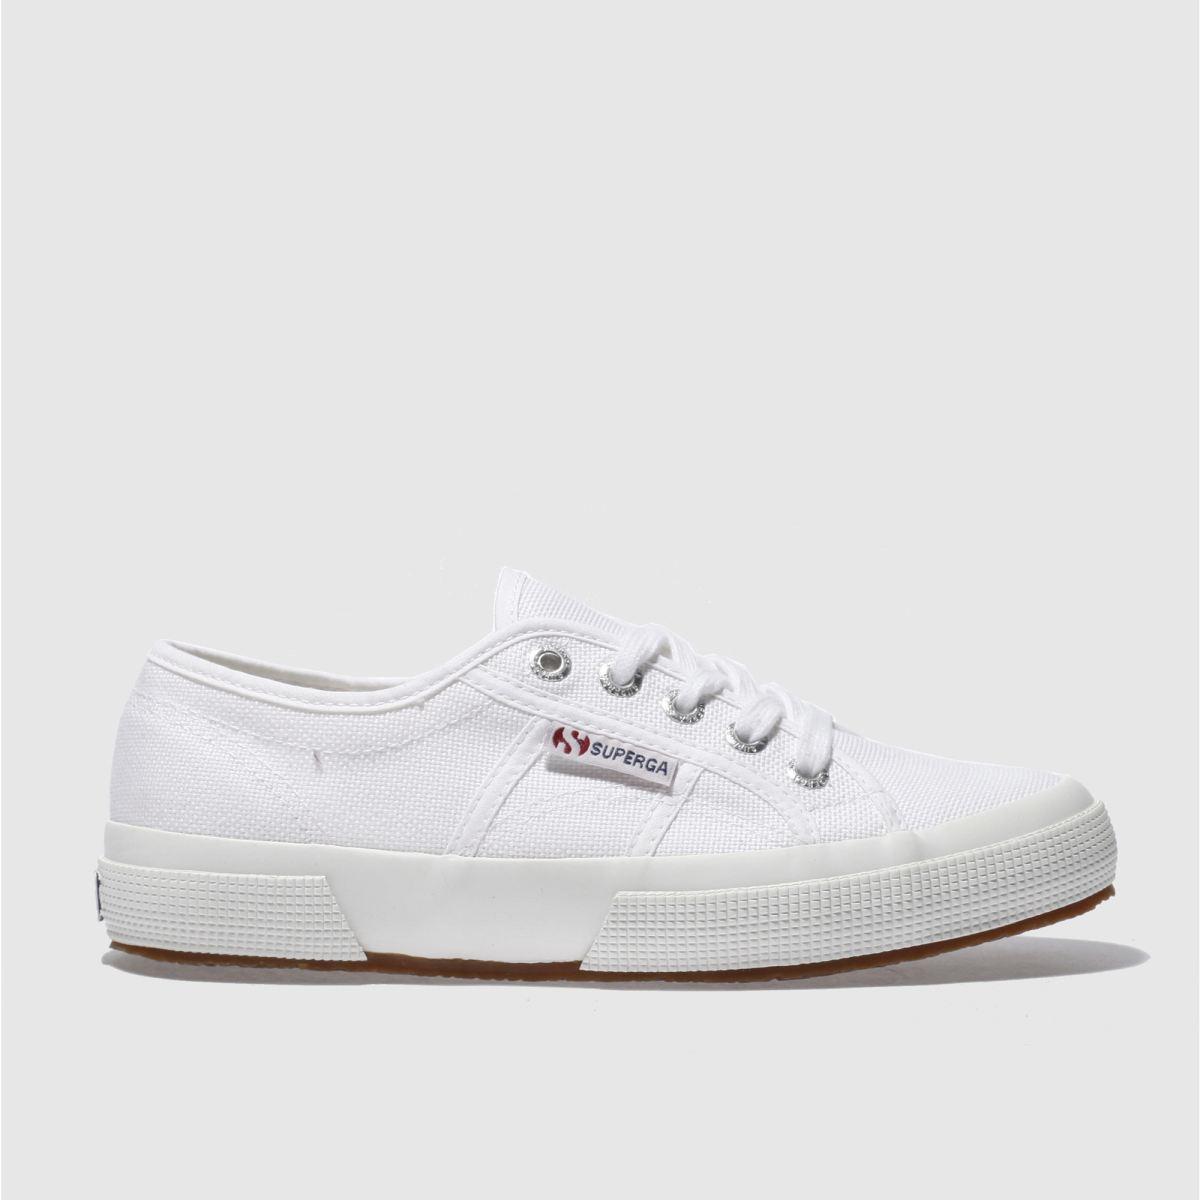 Superga White 2750 Cotton Trainers